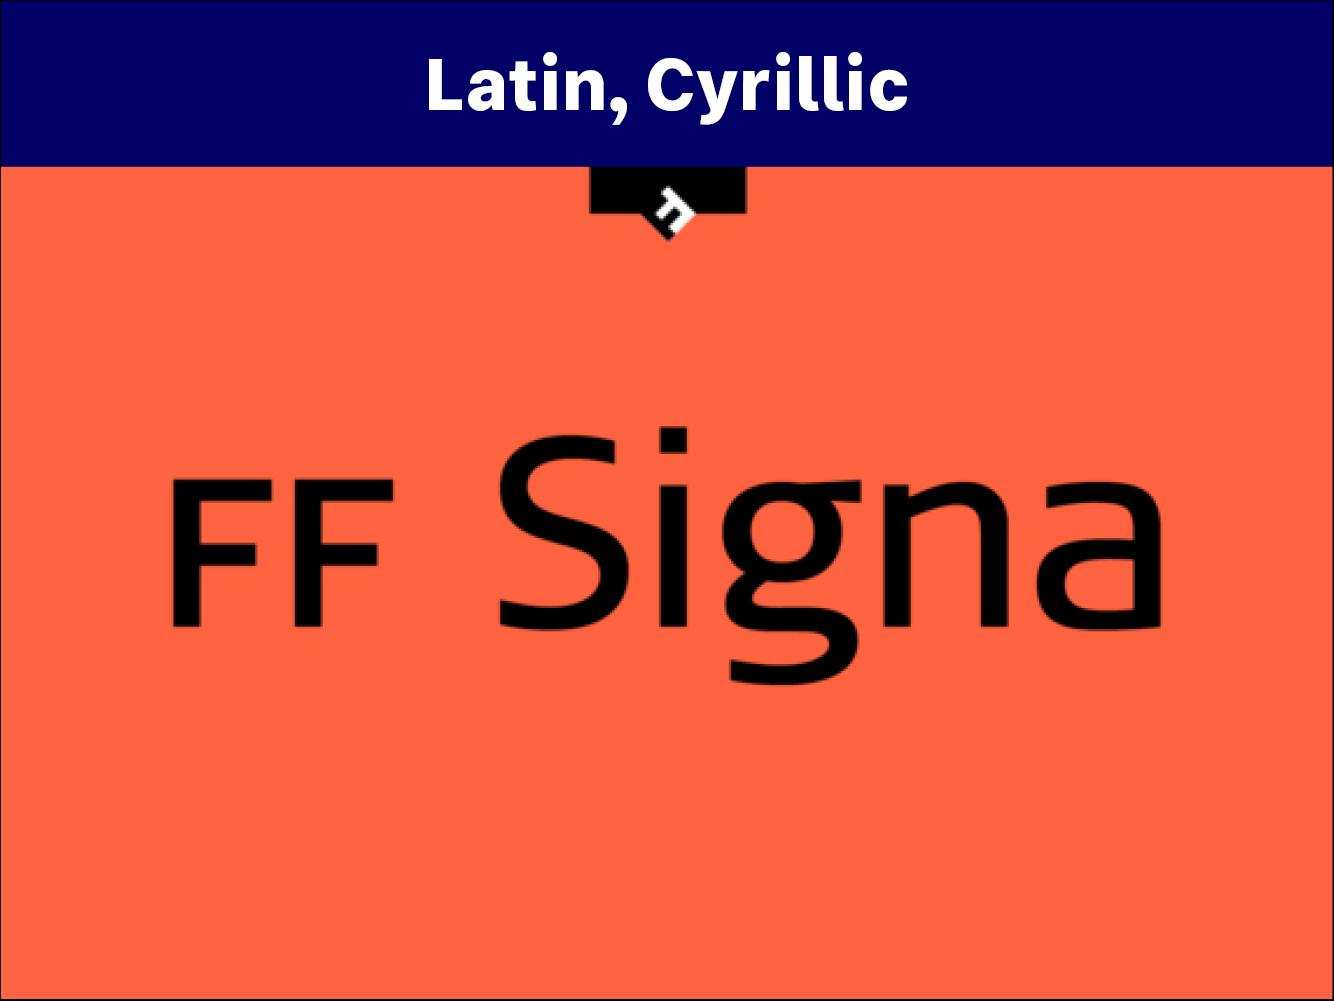 FF Signa